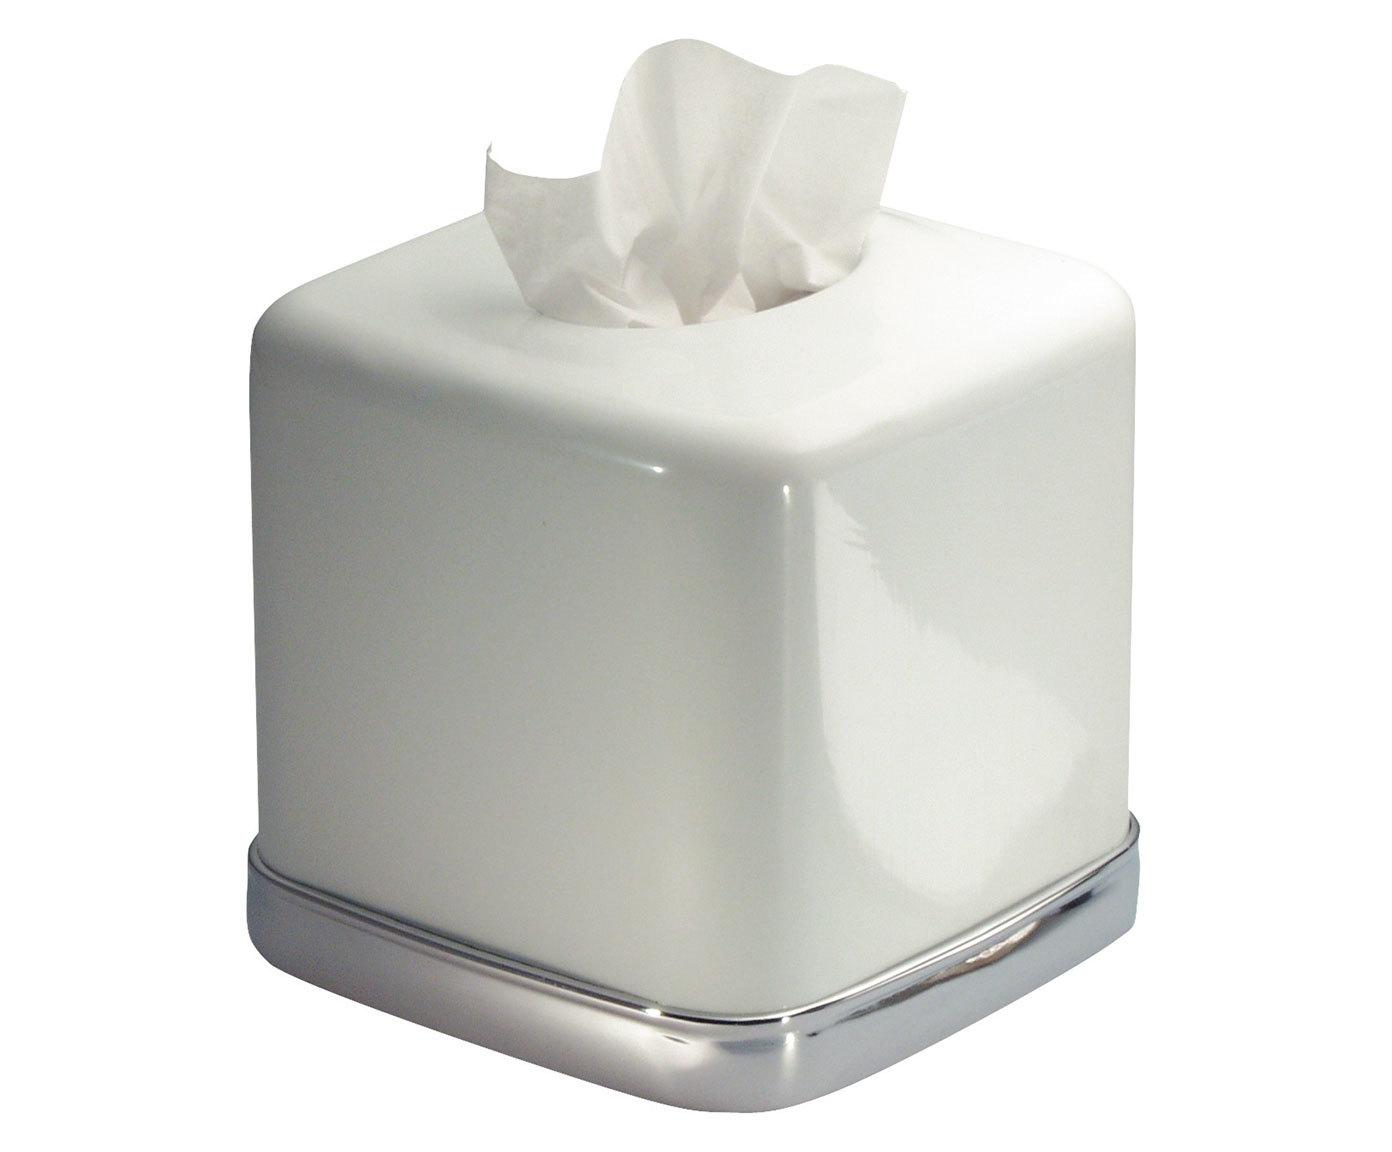 Фото #1: Салфетница York белого цвета